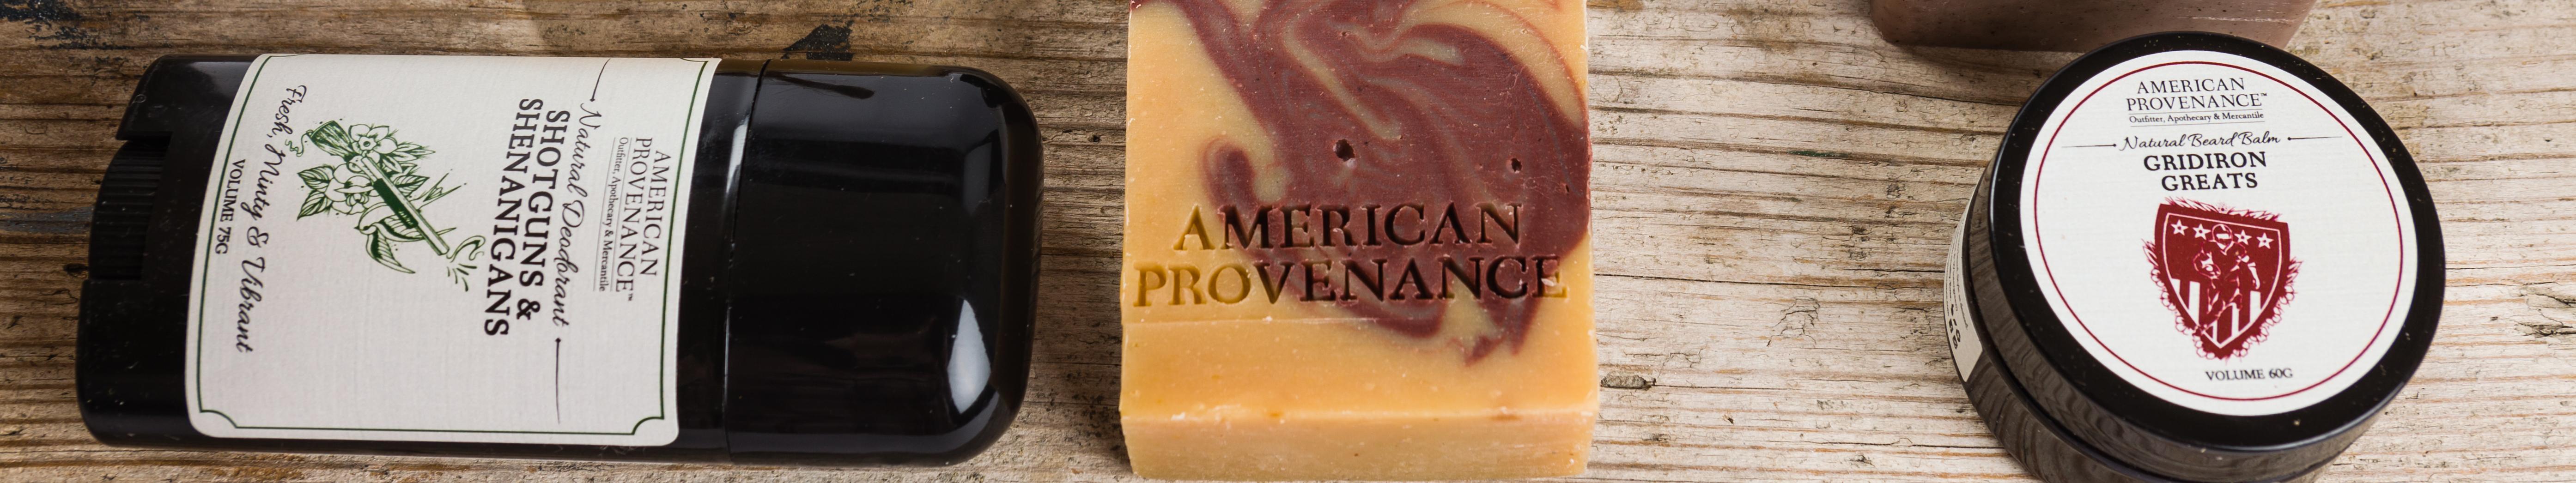 American provedence lifestyle   header.jpg?ixlib=rails 2.1